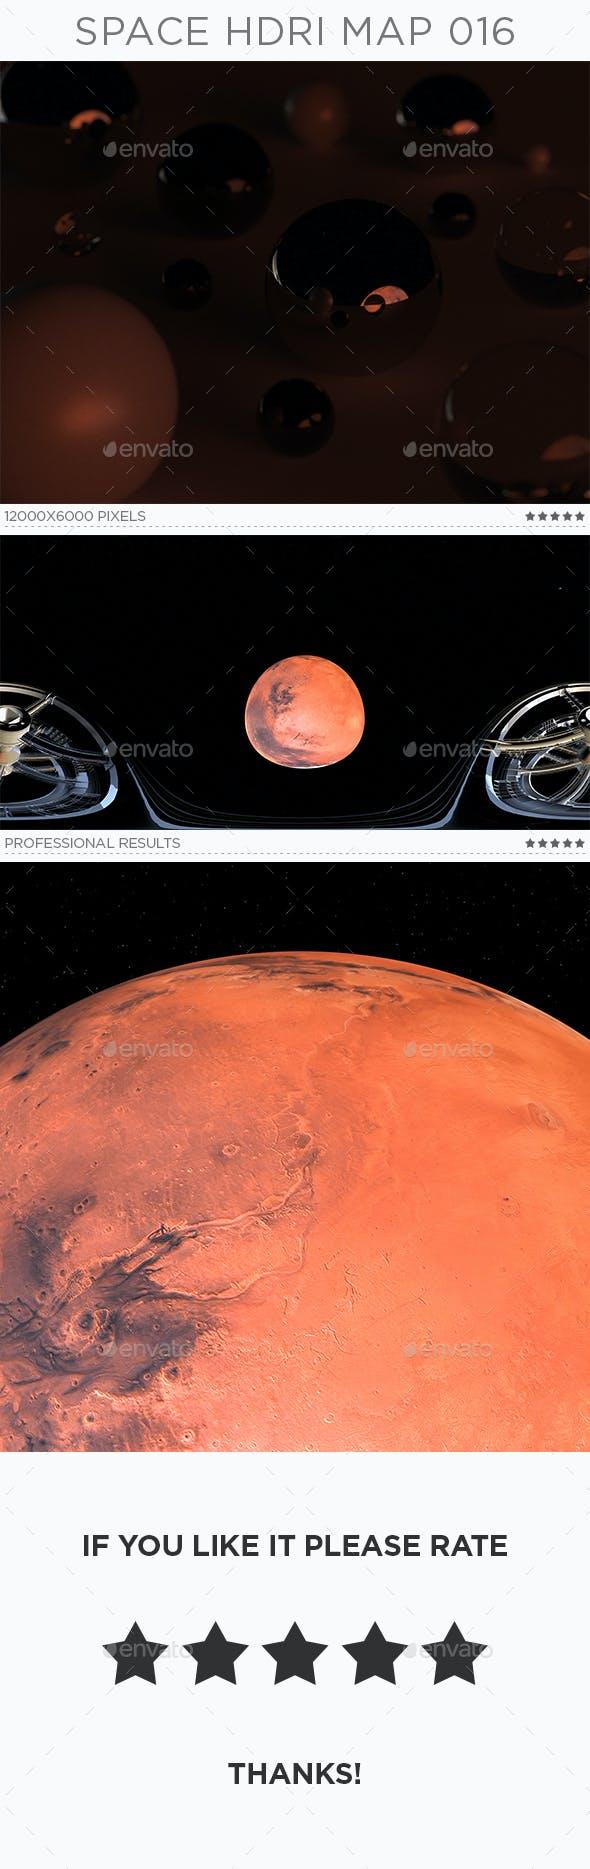 Space HDRi Map 016 - 3DOcean Item for Sale